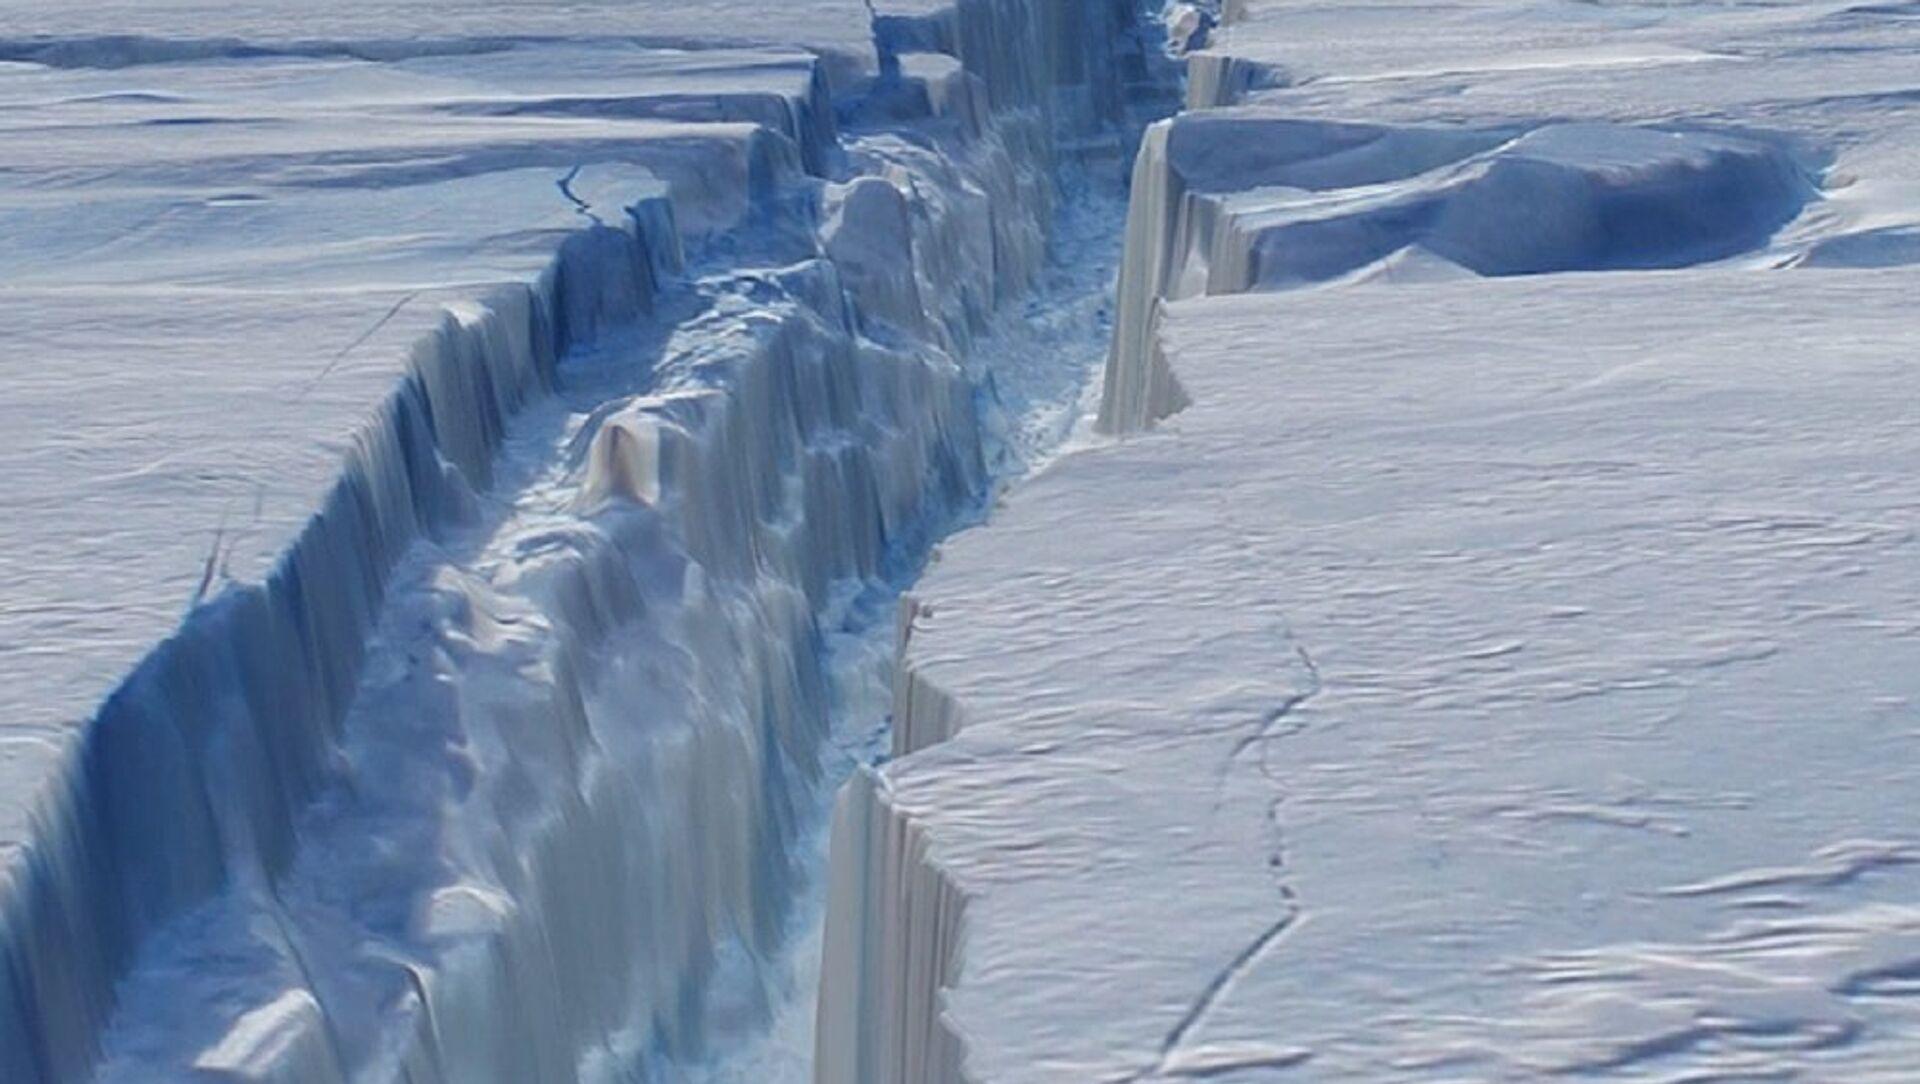 The crack in Antarctica's Pine Island Glacier. - Sputnik International, 1920, 29.07.2021